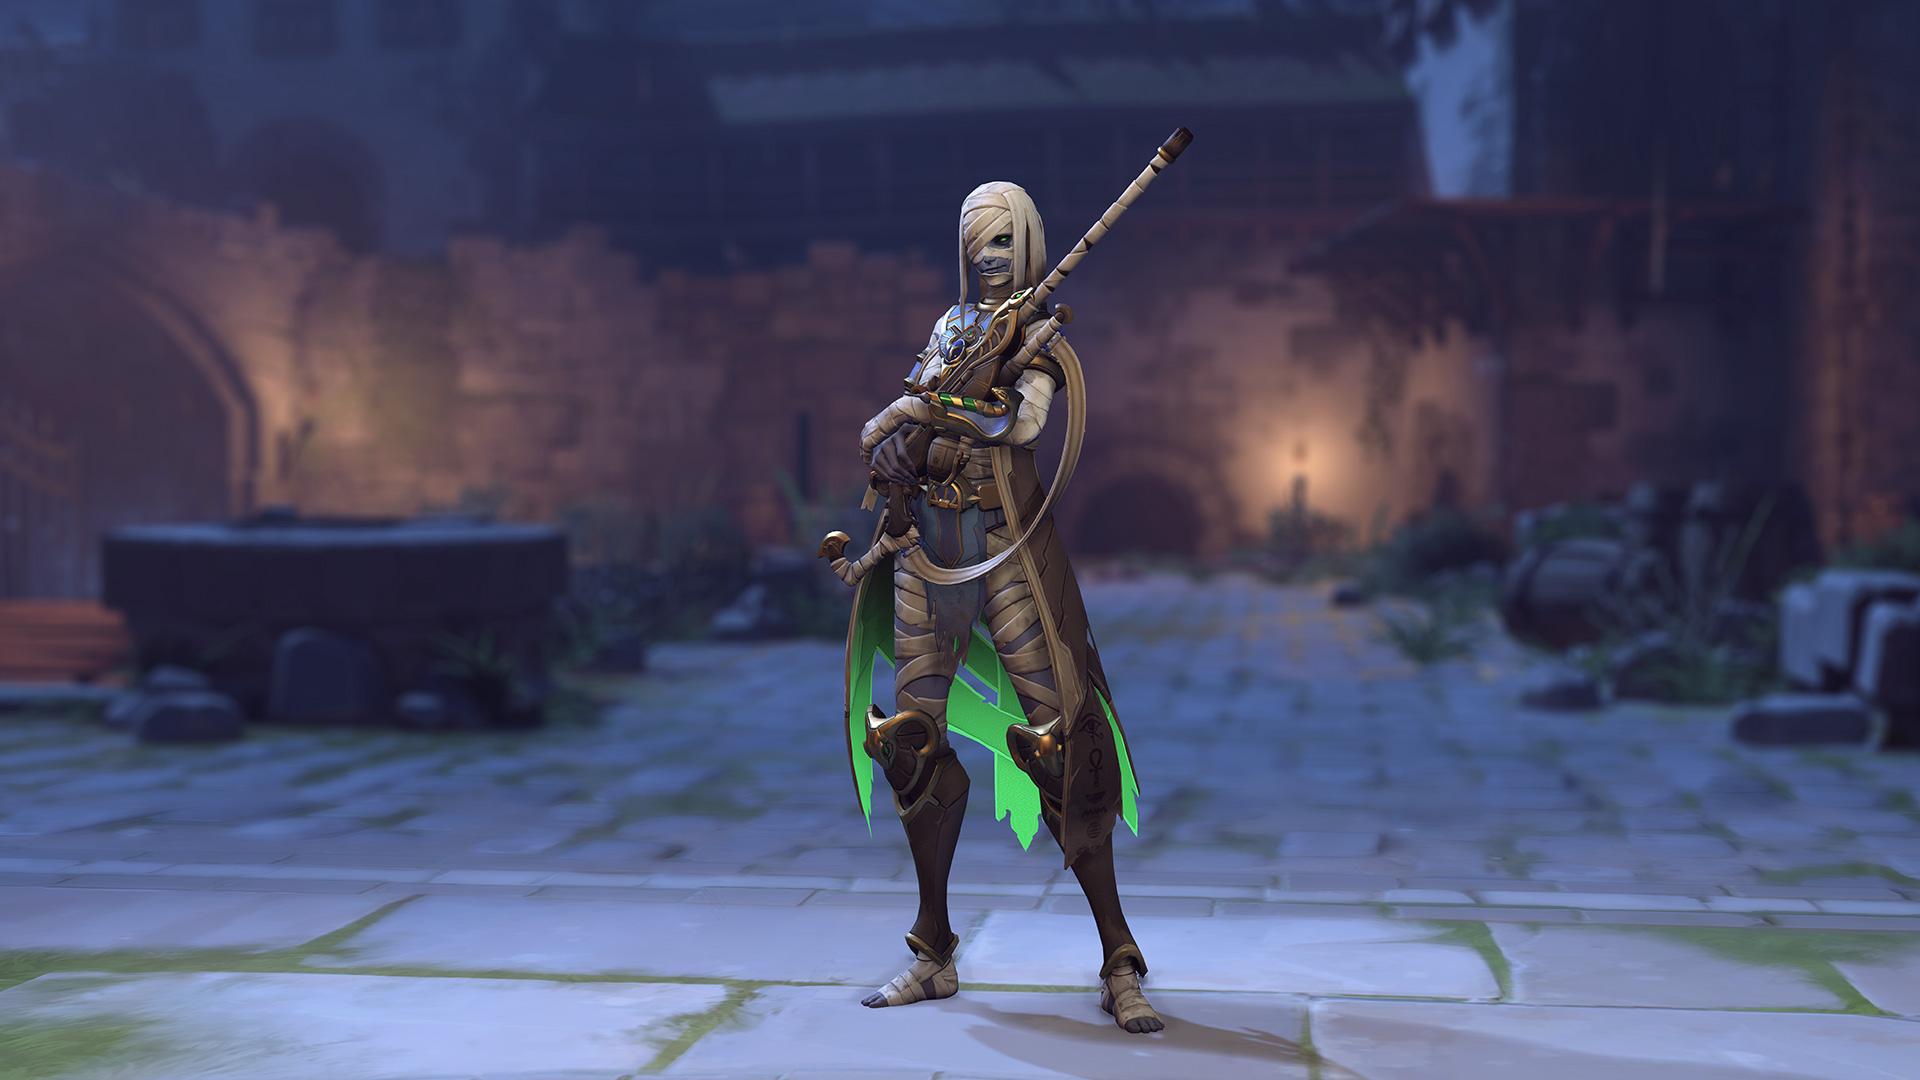 Ana Halloween Skin 2020 The best Overwatch skins released in 2019 | Dot Esports